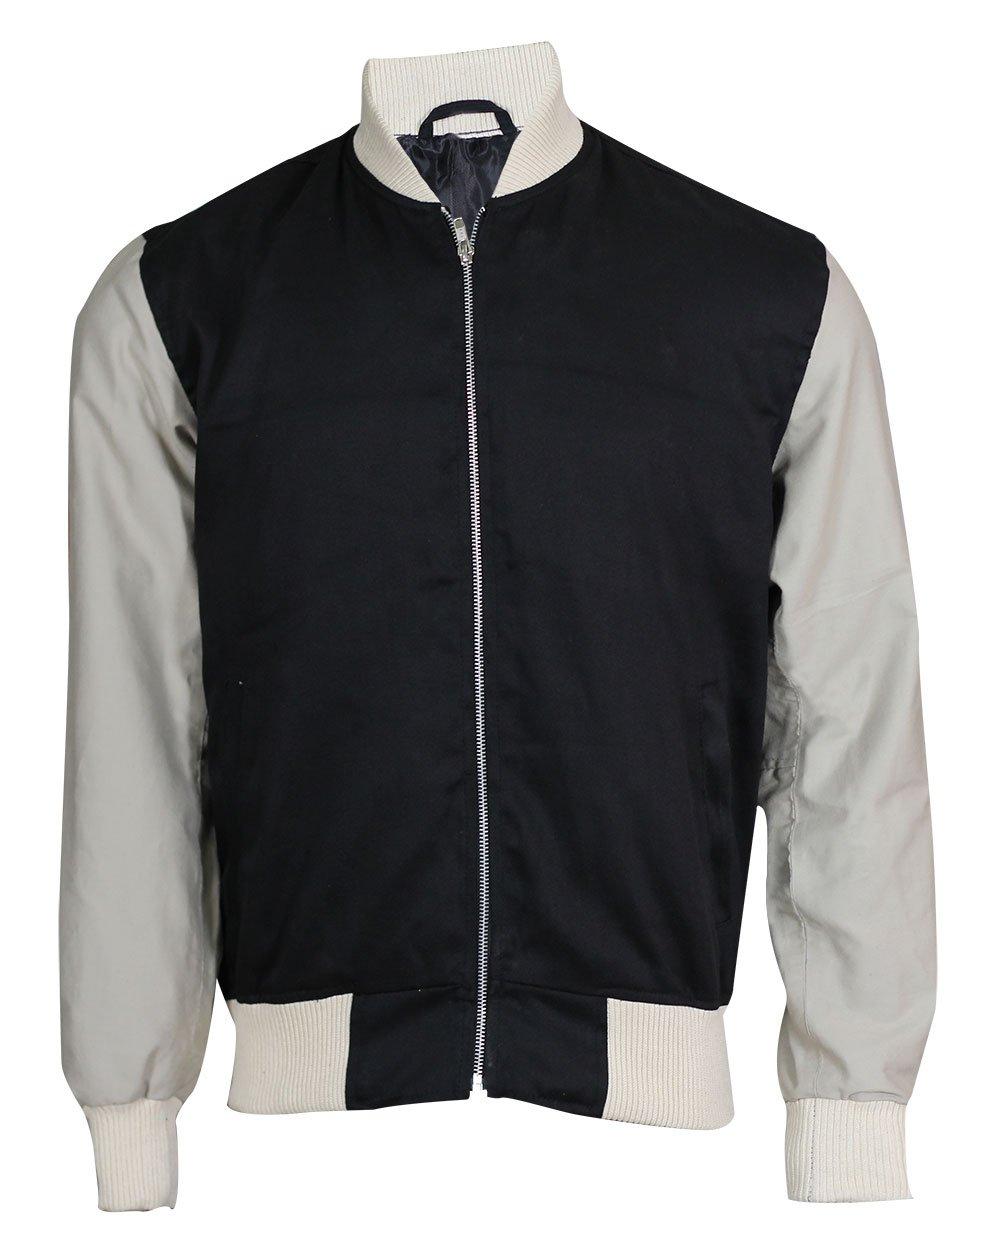 Baby Driver Jacket Ansel Elgort Varsity Bomber Jacket by III-Fashions